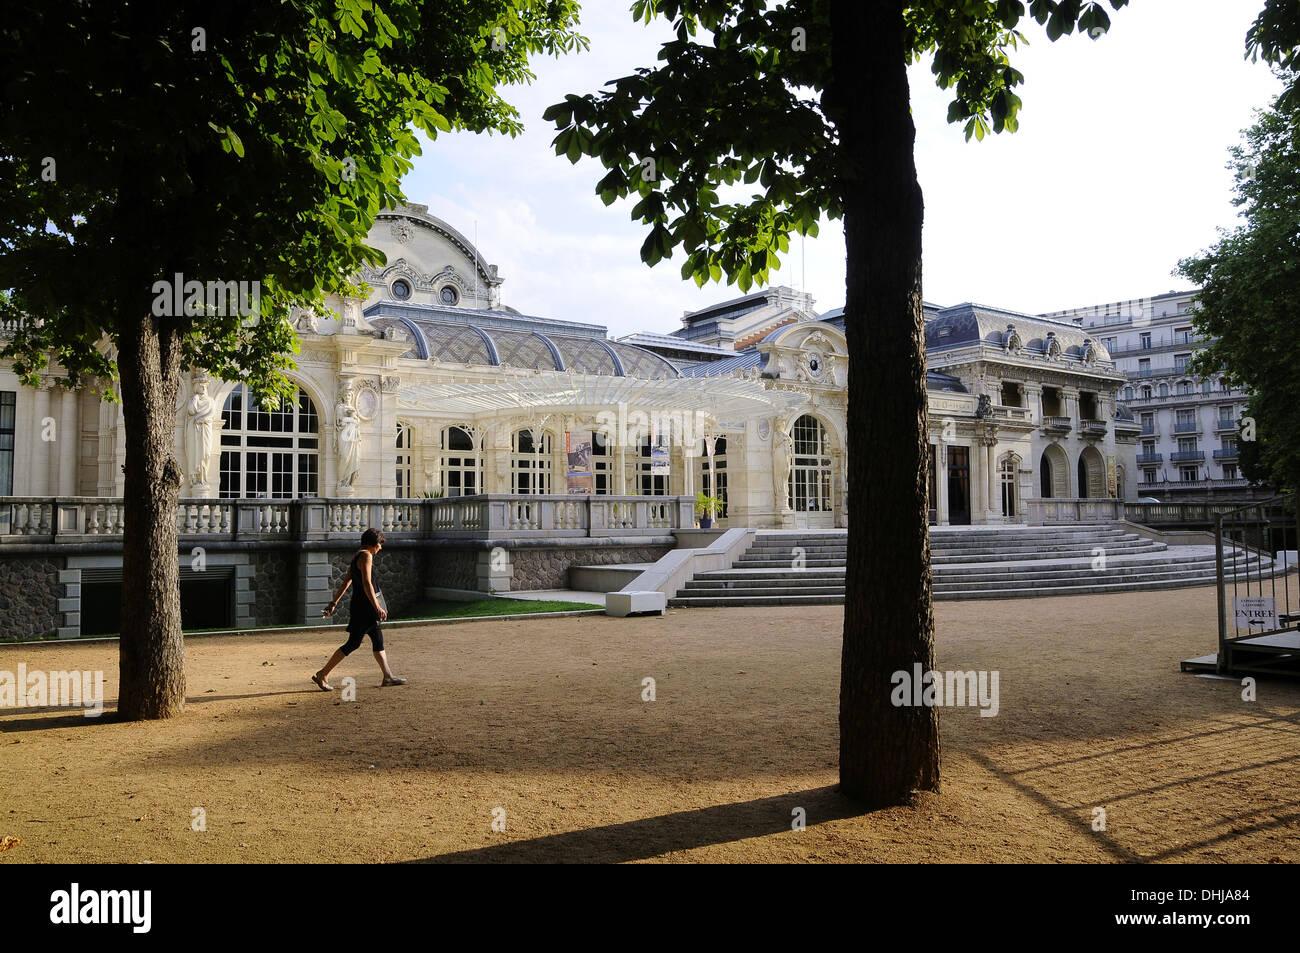 Opera and congress hall, Vichy, Bourbonnais, Auvergne, France, Europe - Stock Image